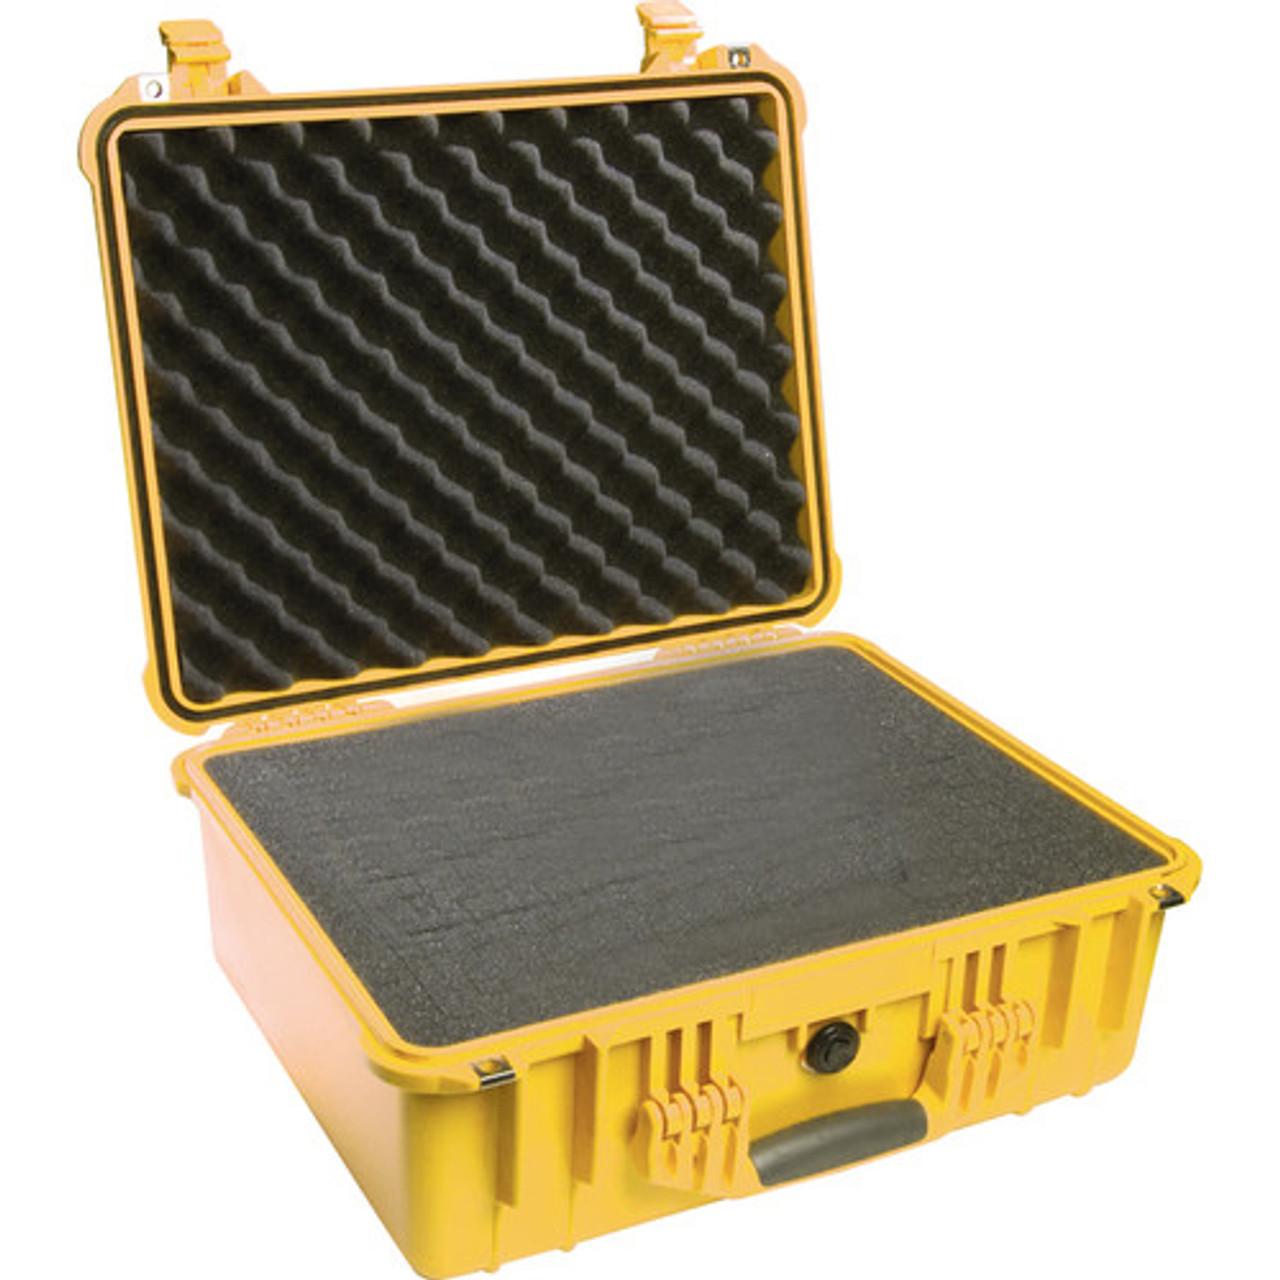 Pelican 1550 Protector - Medium Case - Waterproof, Crushproof, Rustproof, Hard Case with Optional Foam Inserts, Padded Divider or TrekPak Divider System, 21 x 19 x 19, 27 lbs (24 lbs w-out foam insert)